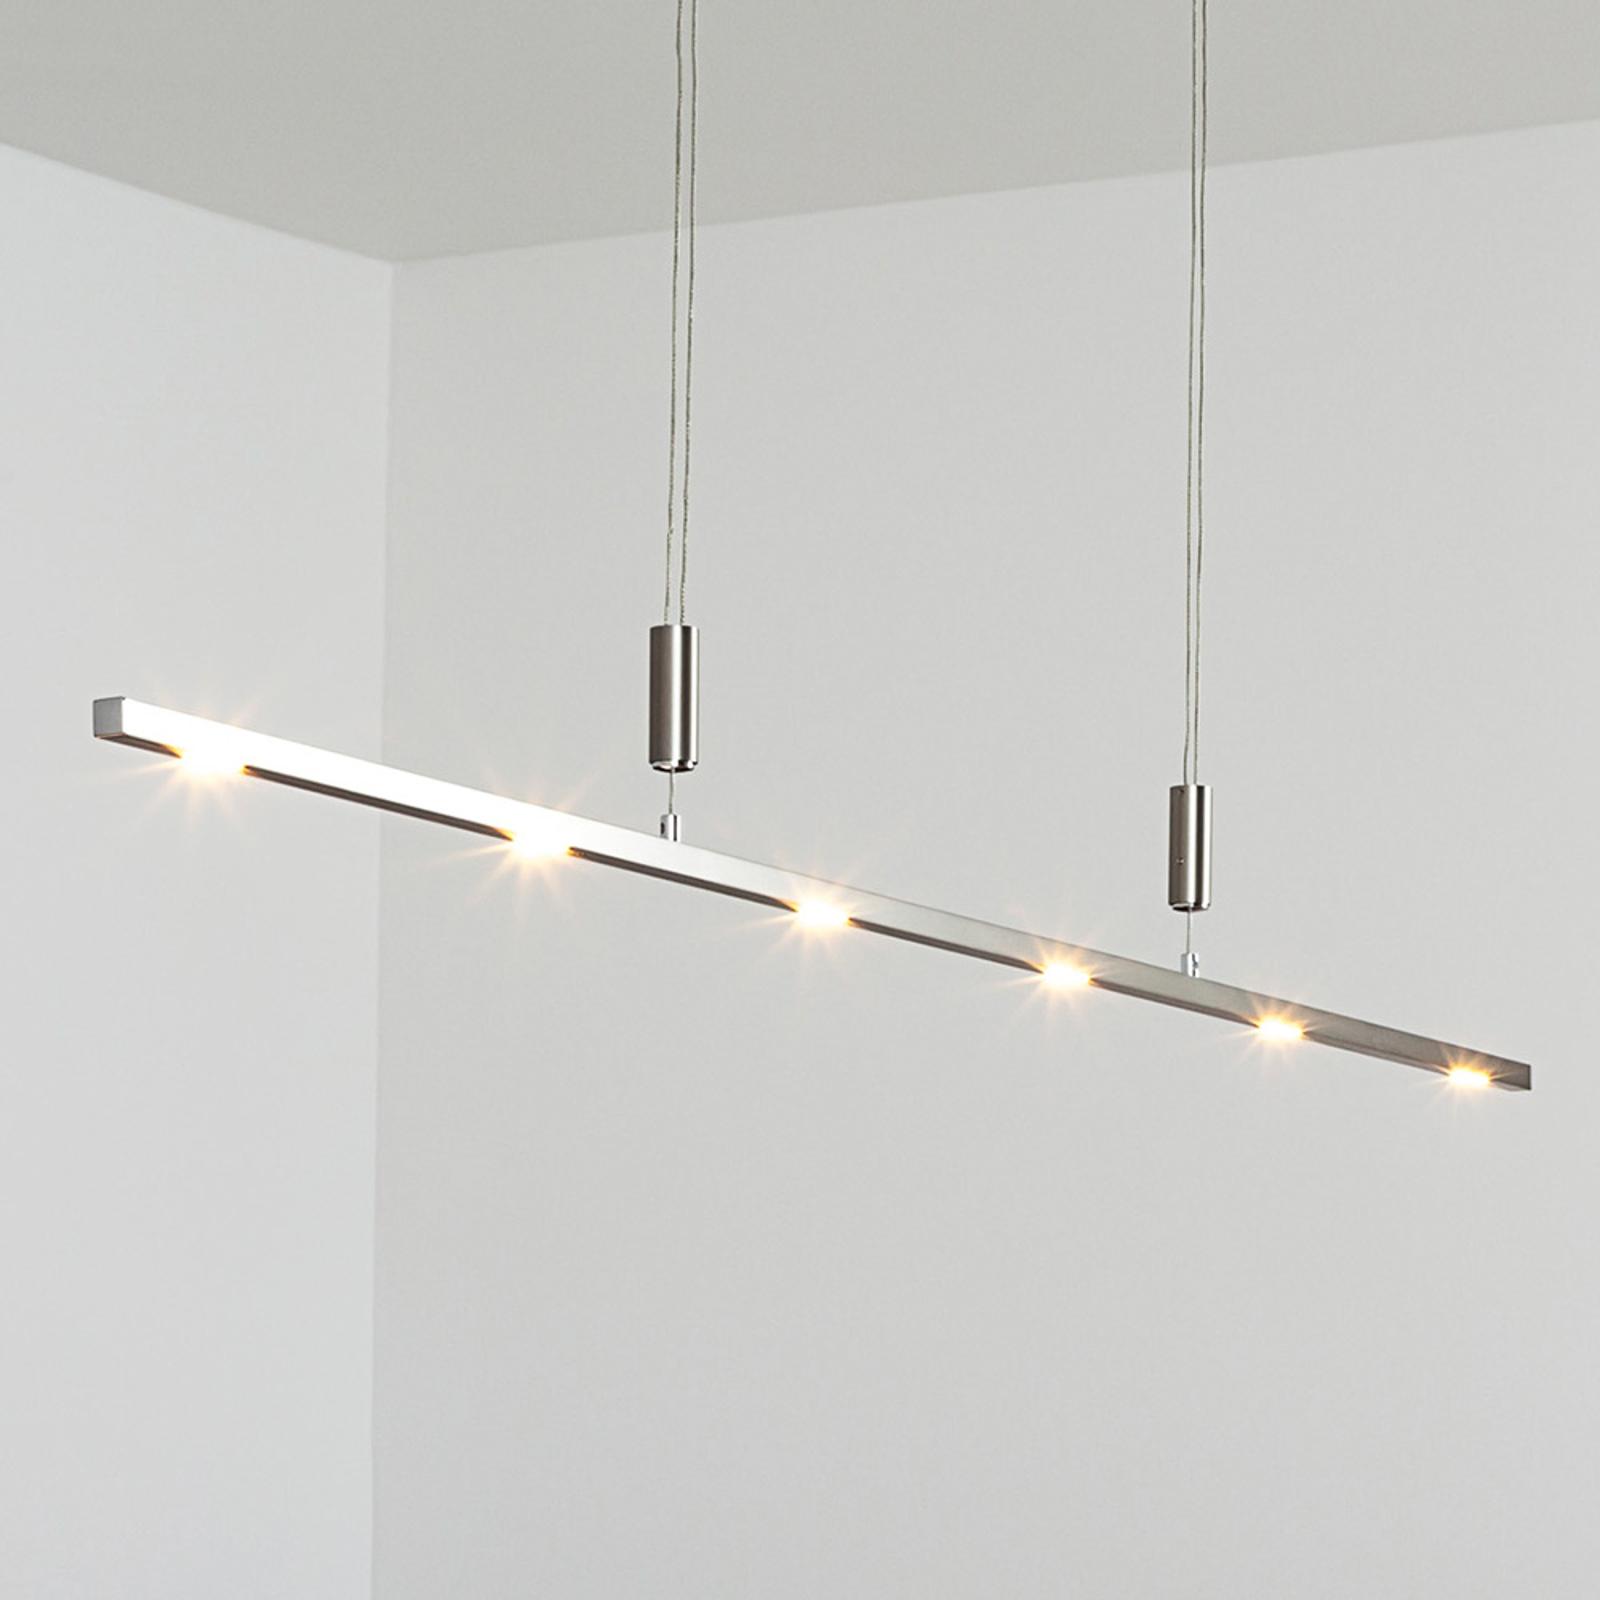 Høyderegulerbar LED-hengelampe Tolu 140 cm